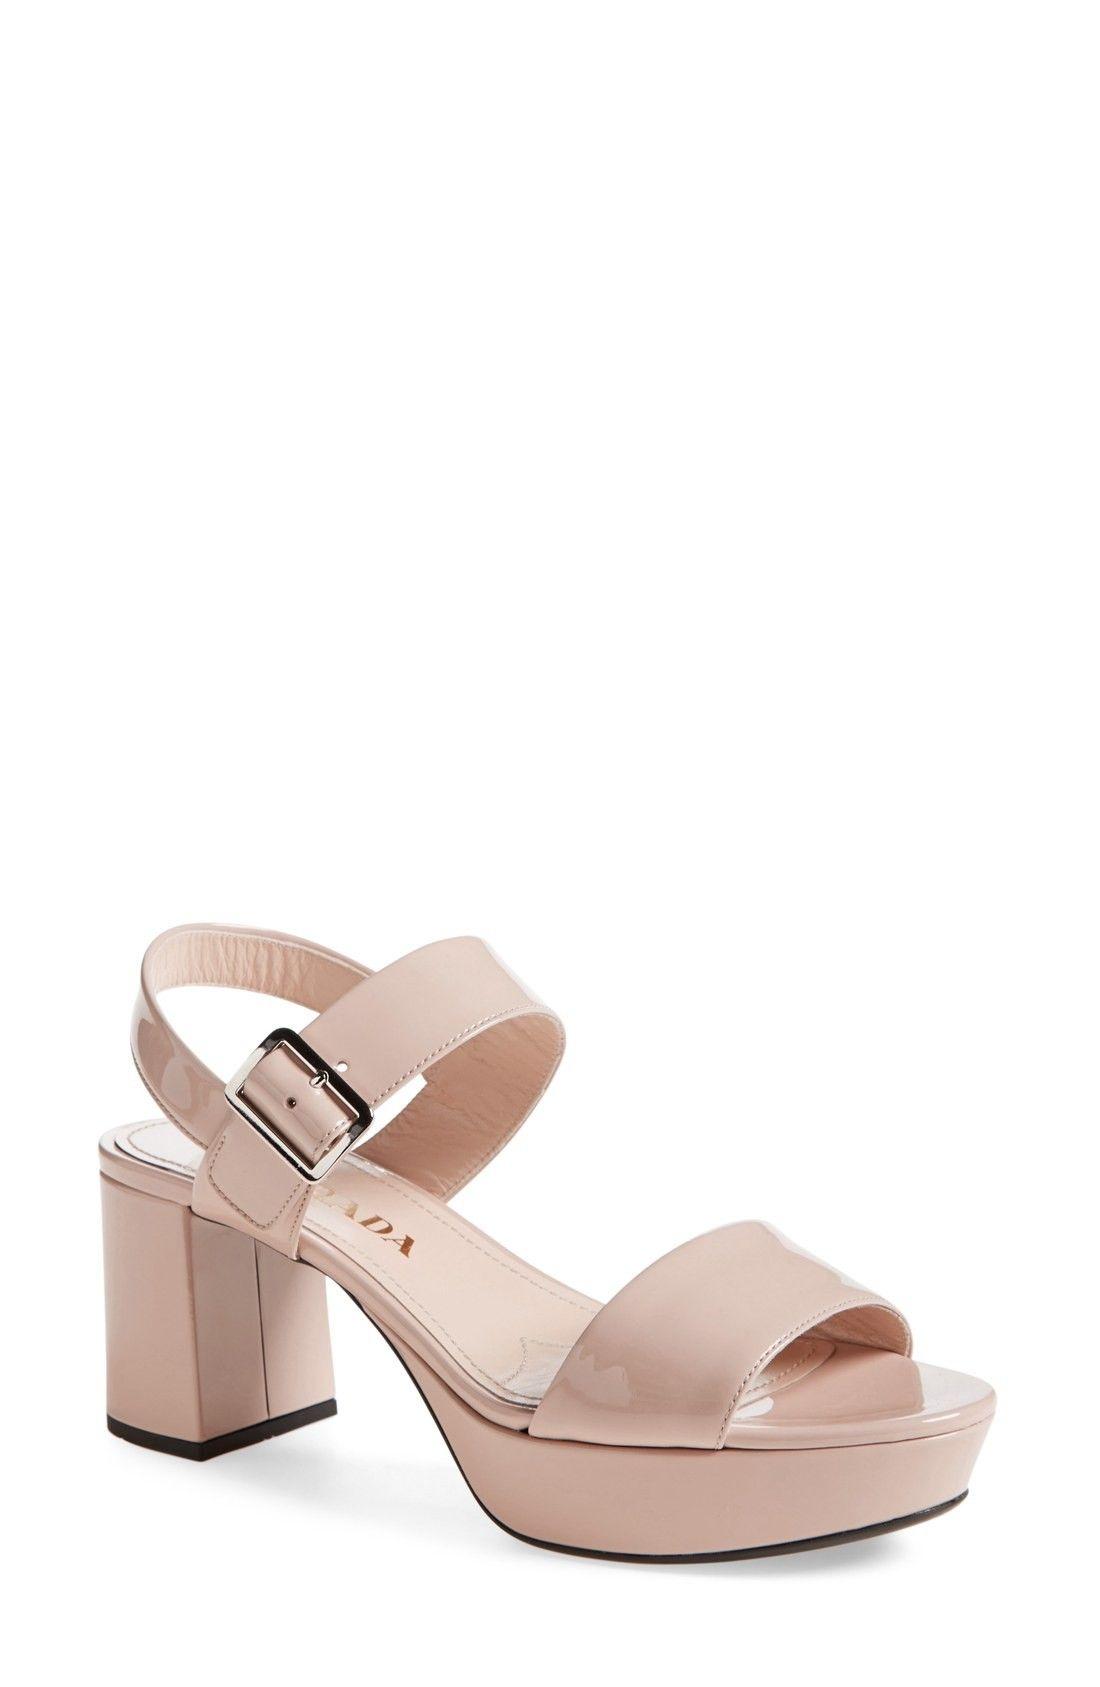 abf16b1bda16 Free shipping and returns on Prada Block Heel Sandal (Women) at  Fashiondoxy.com.